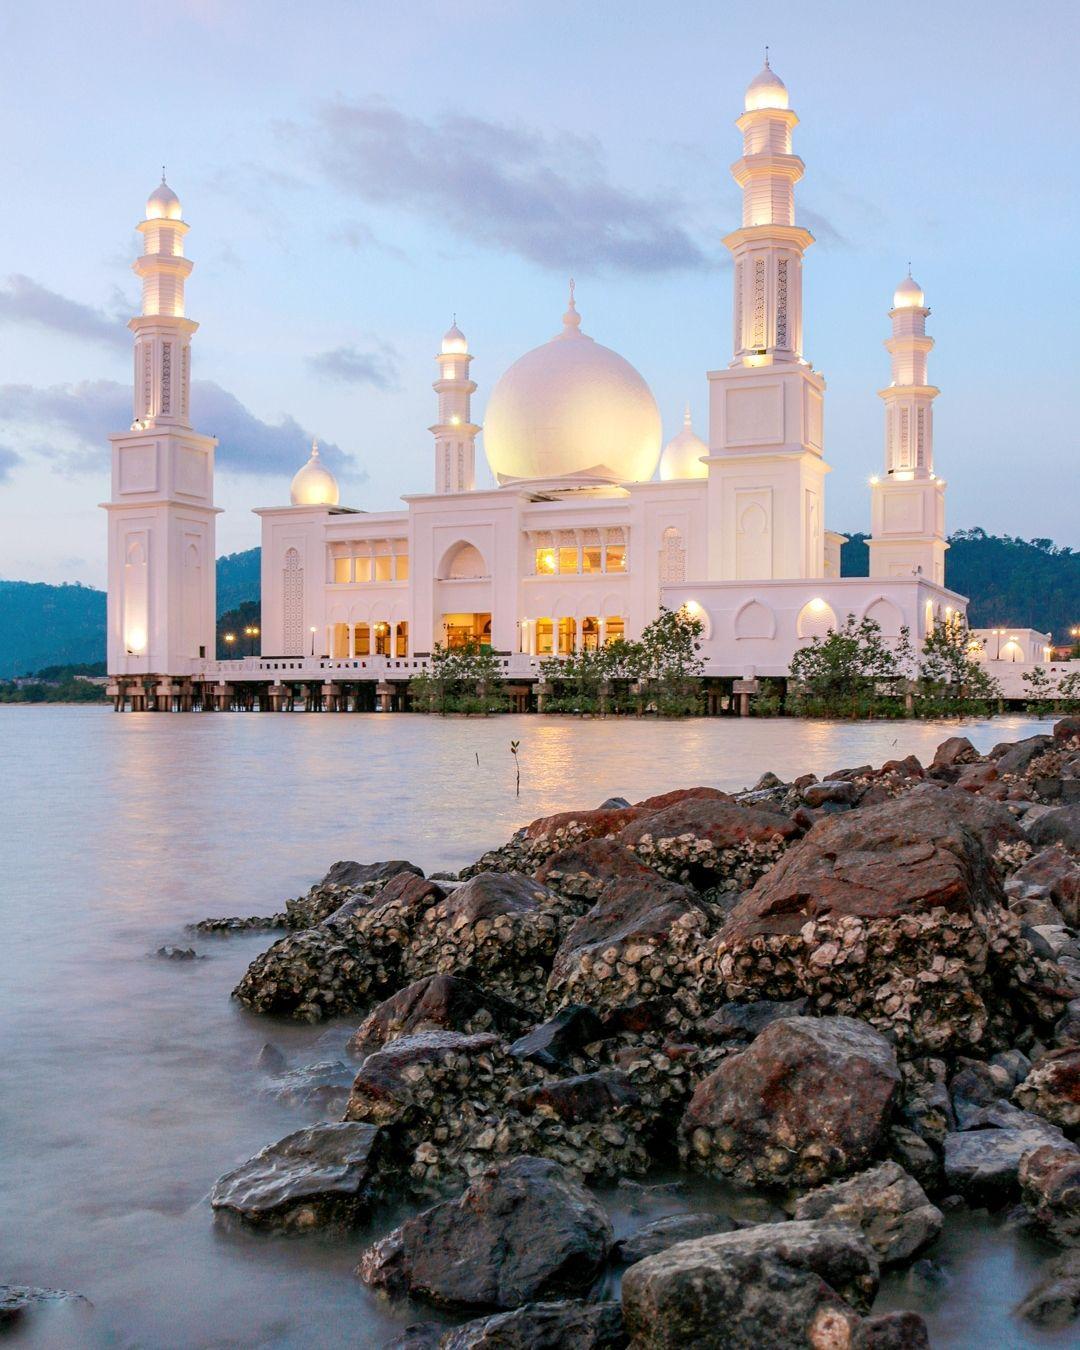 Masjid Oesman Al-Khair Great Mosque Kalimantan